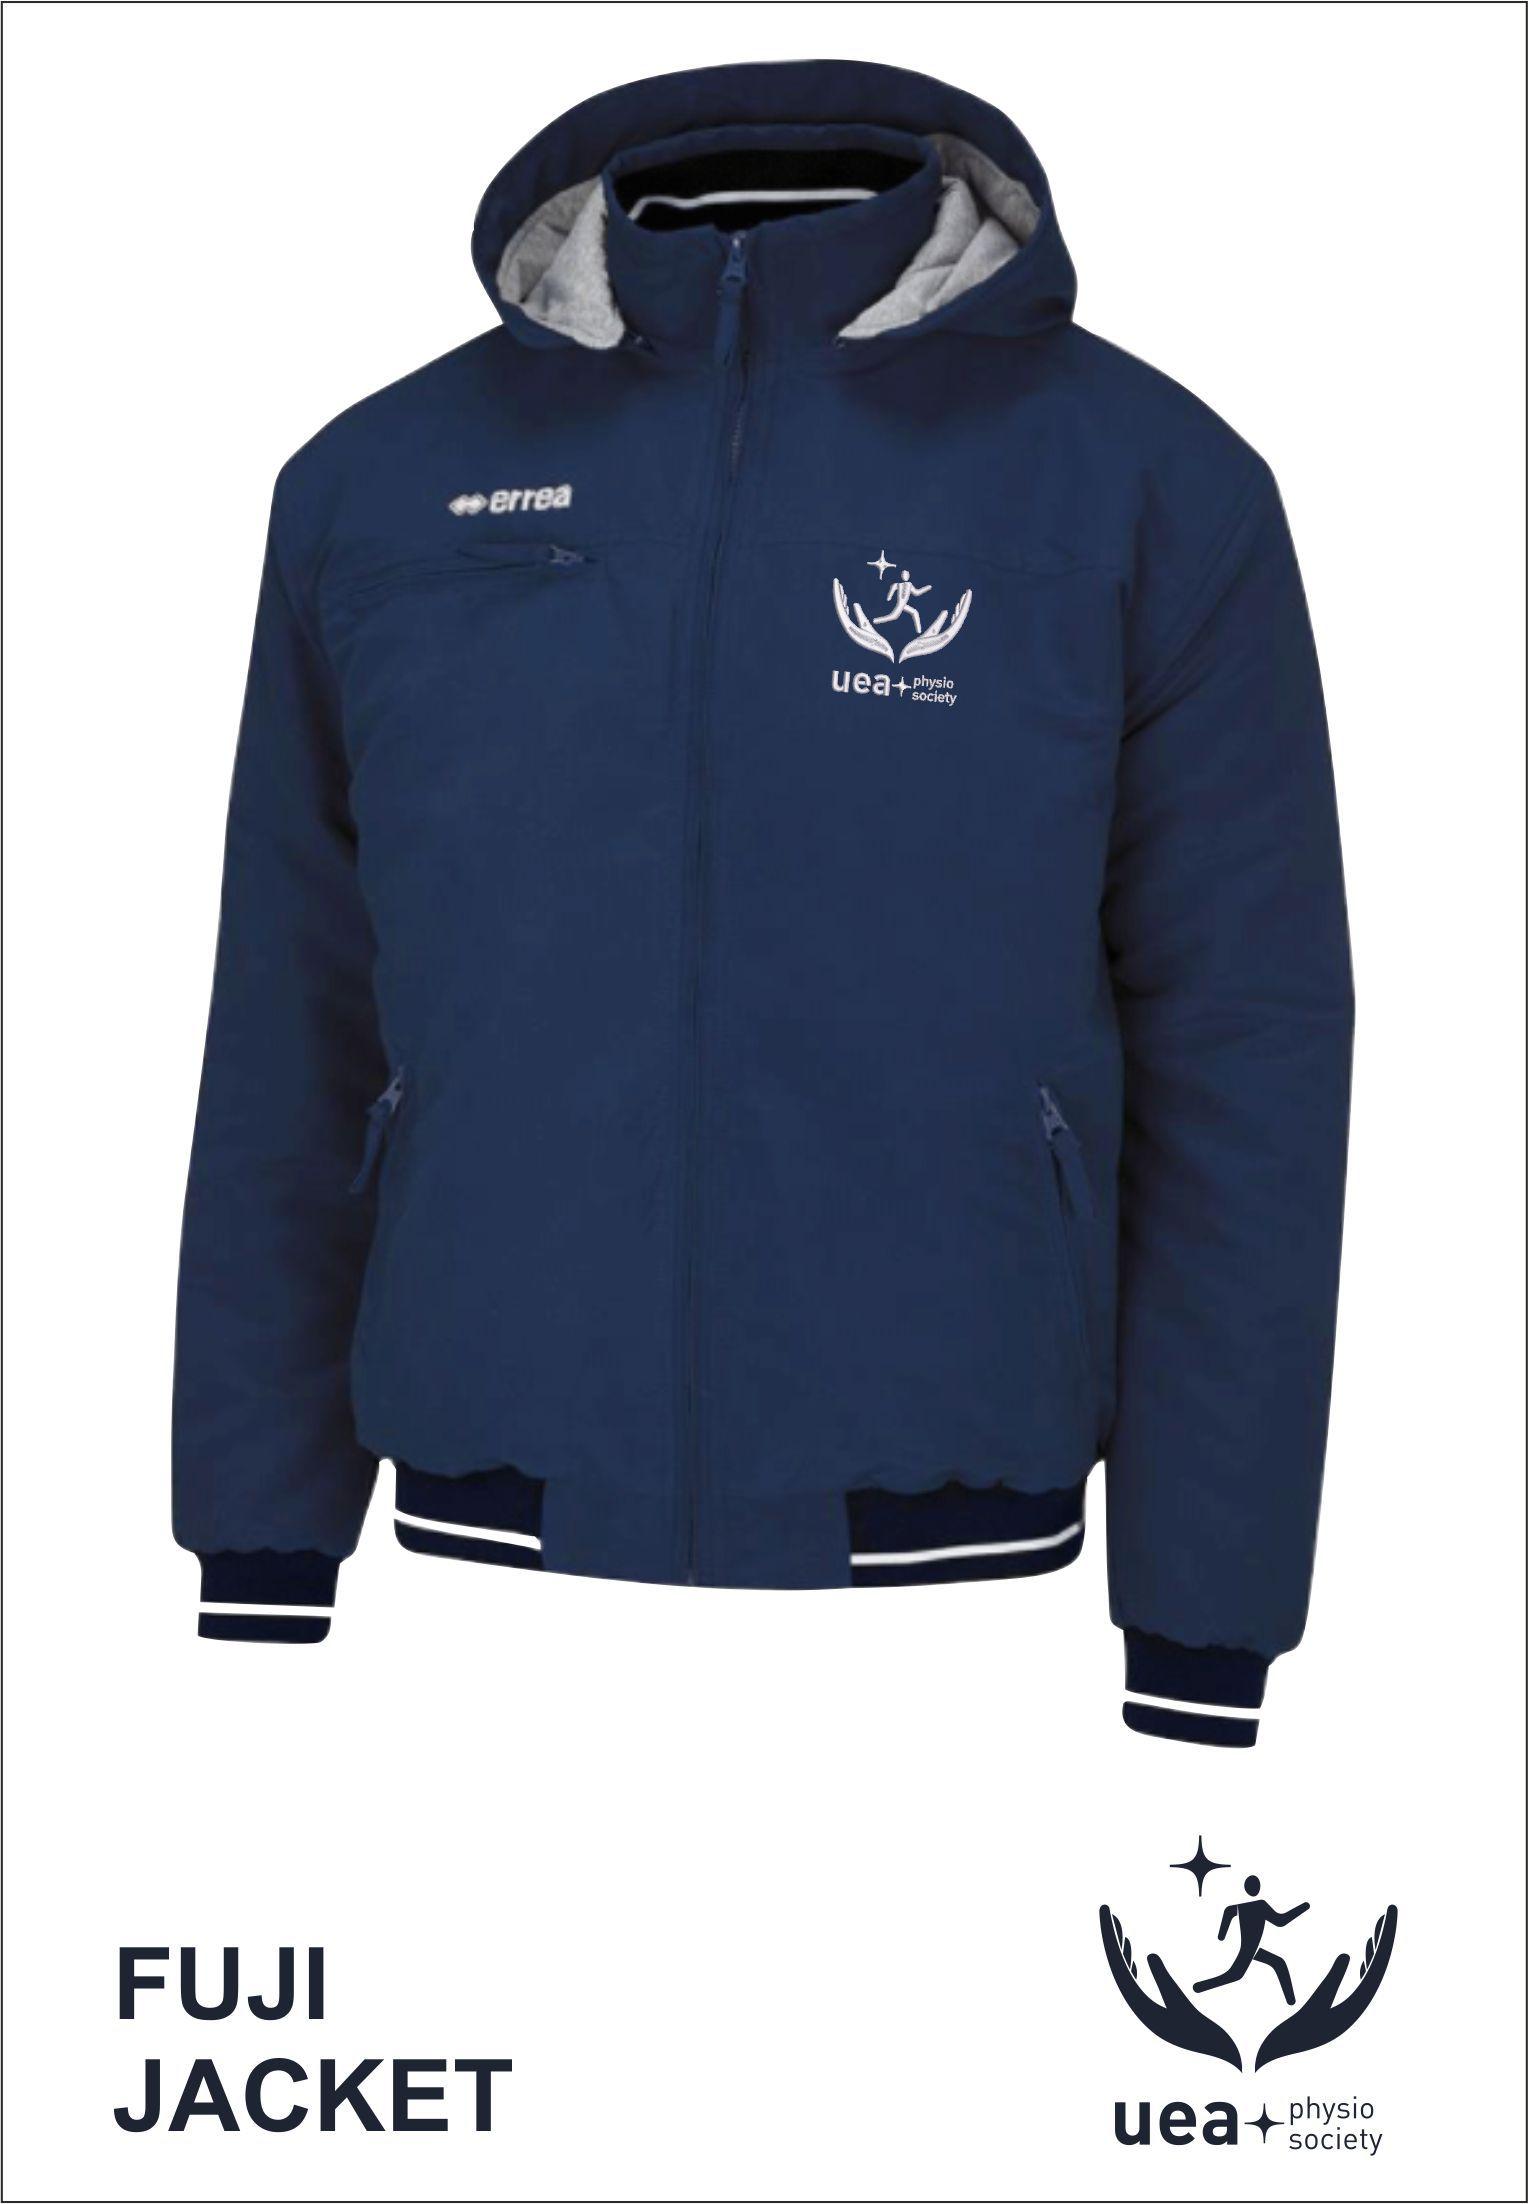 Fuji Jacket Front Navy